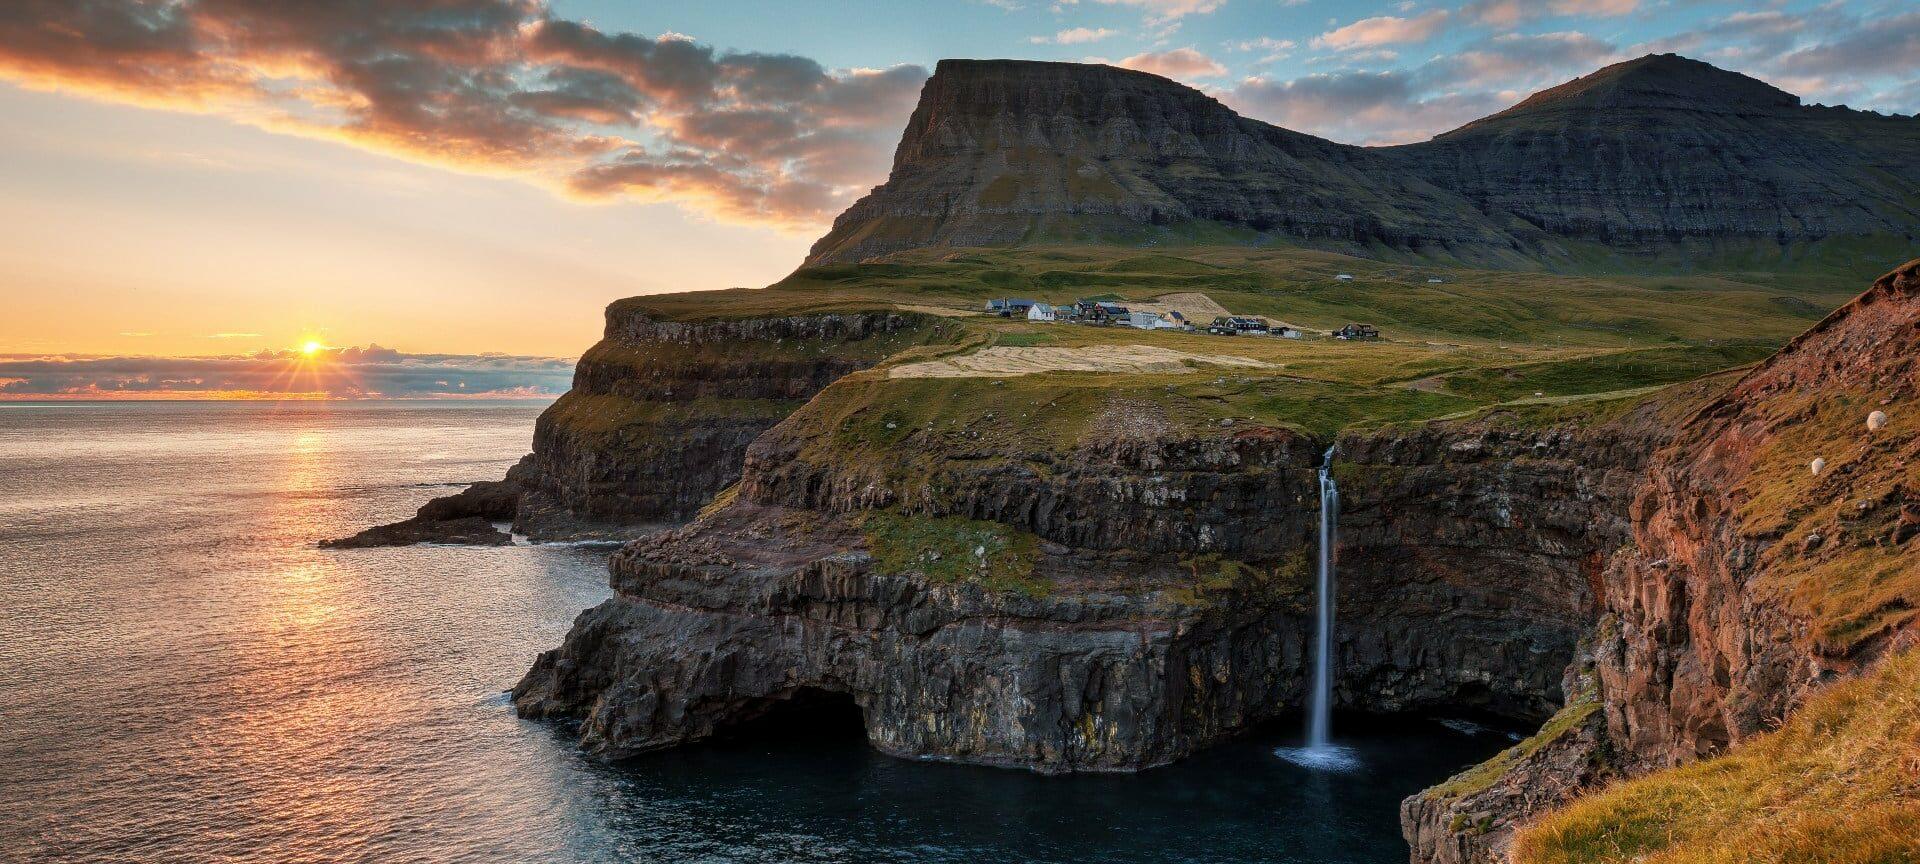 Múlafossur - Guide to Faroe Islands